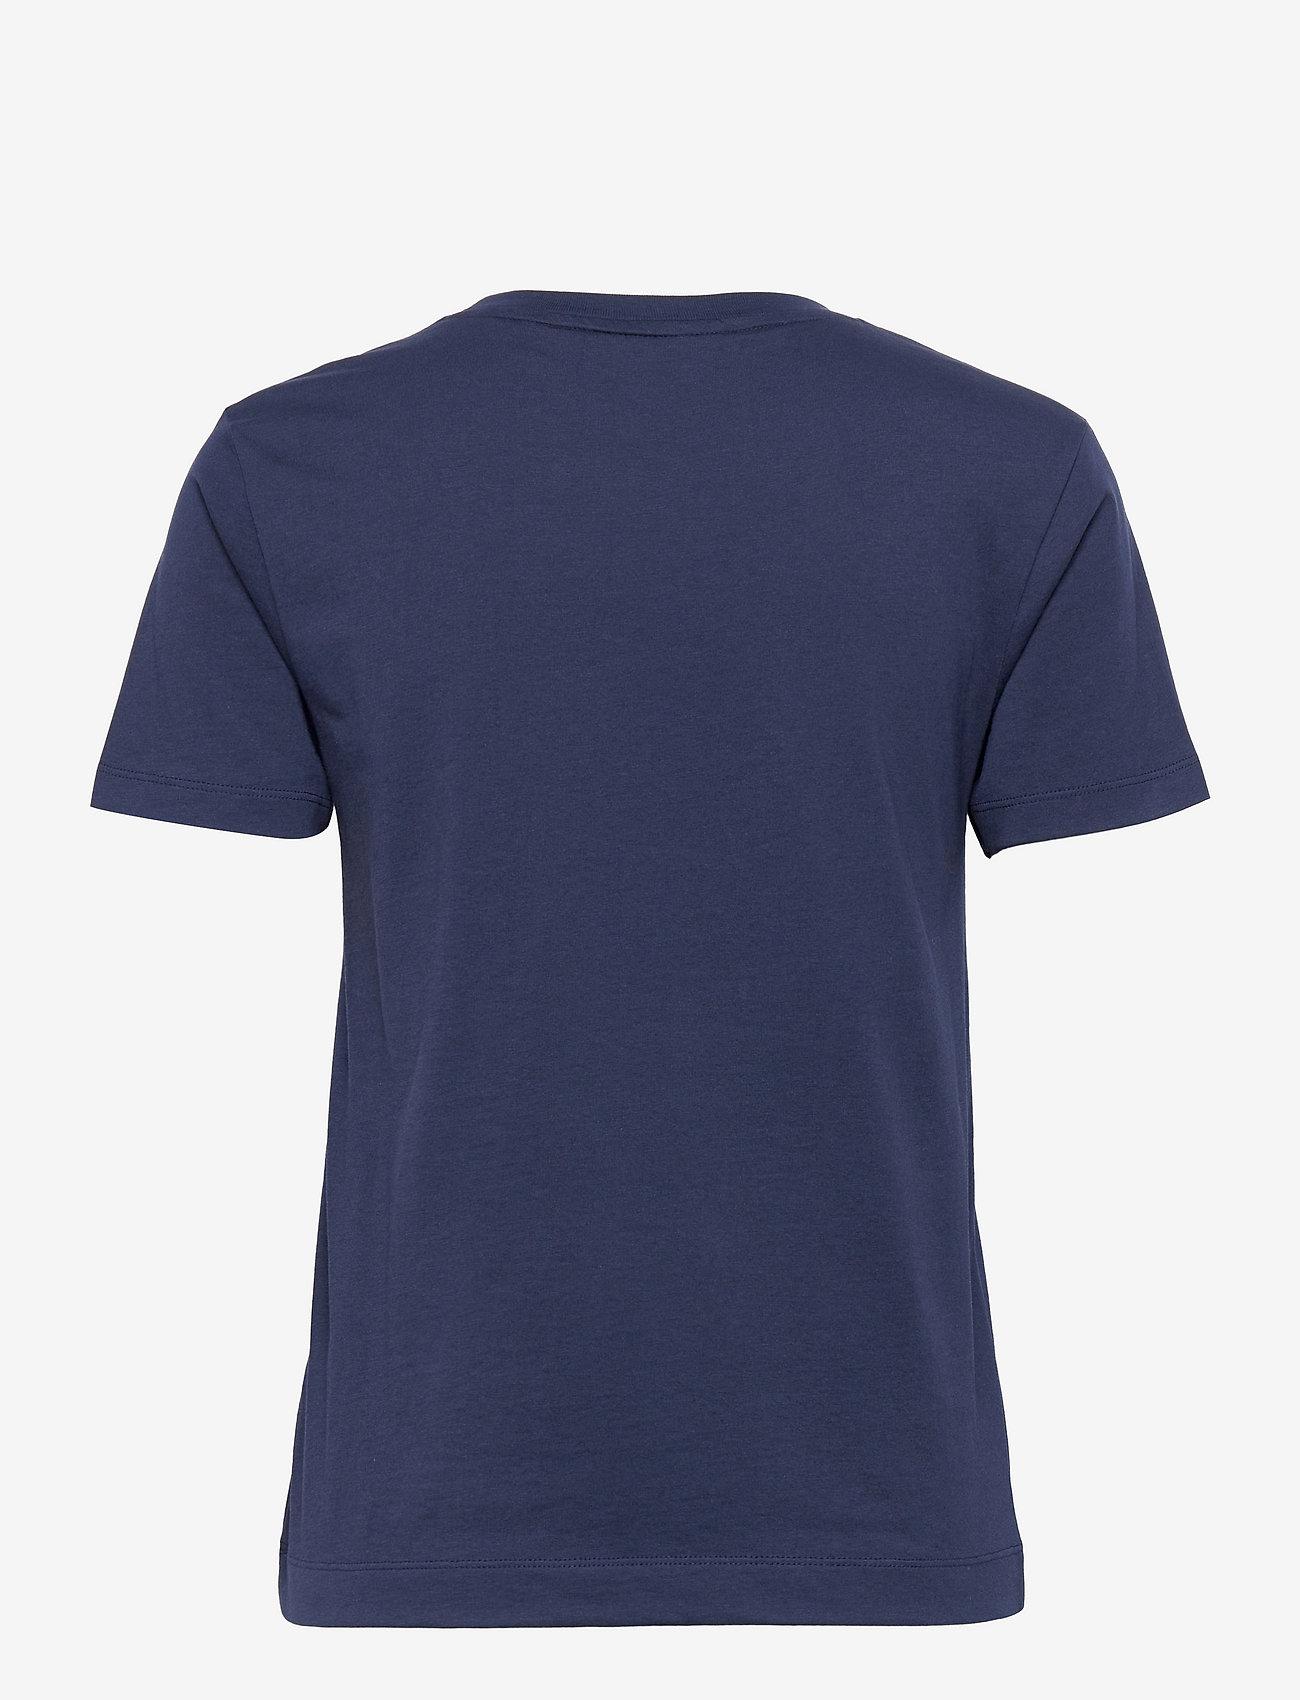 GANT - MD. FALL SS T-SHIRT - t-shirts - evening blue - 1